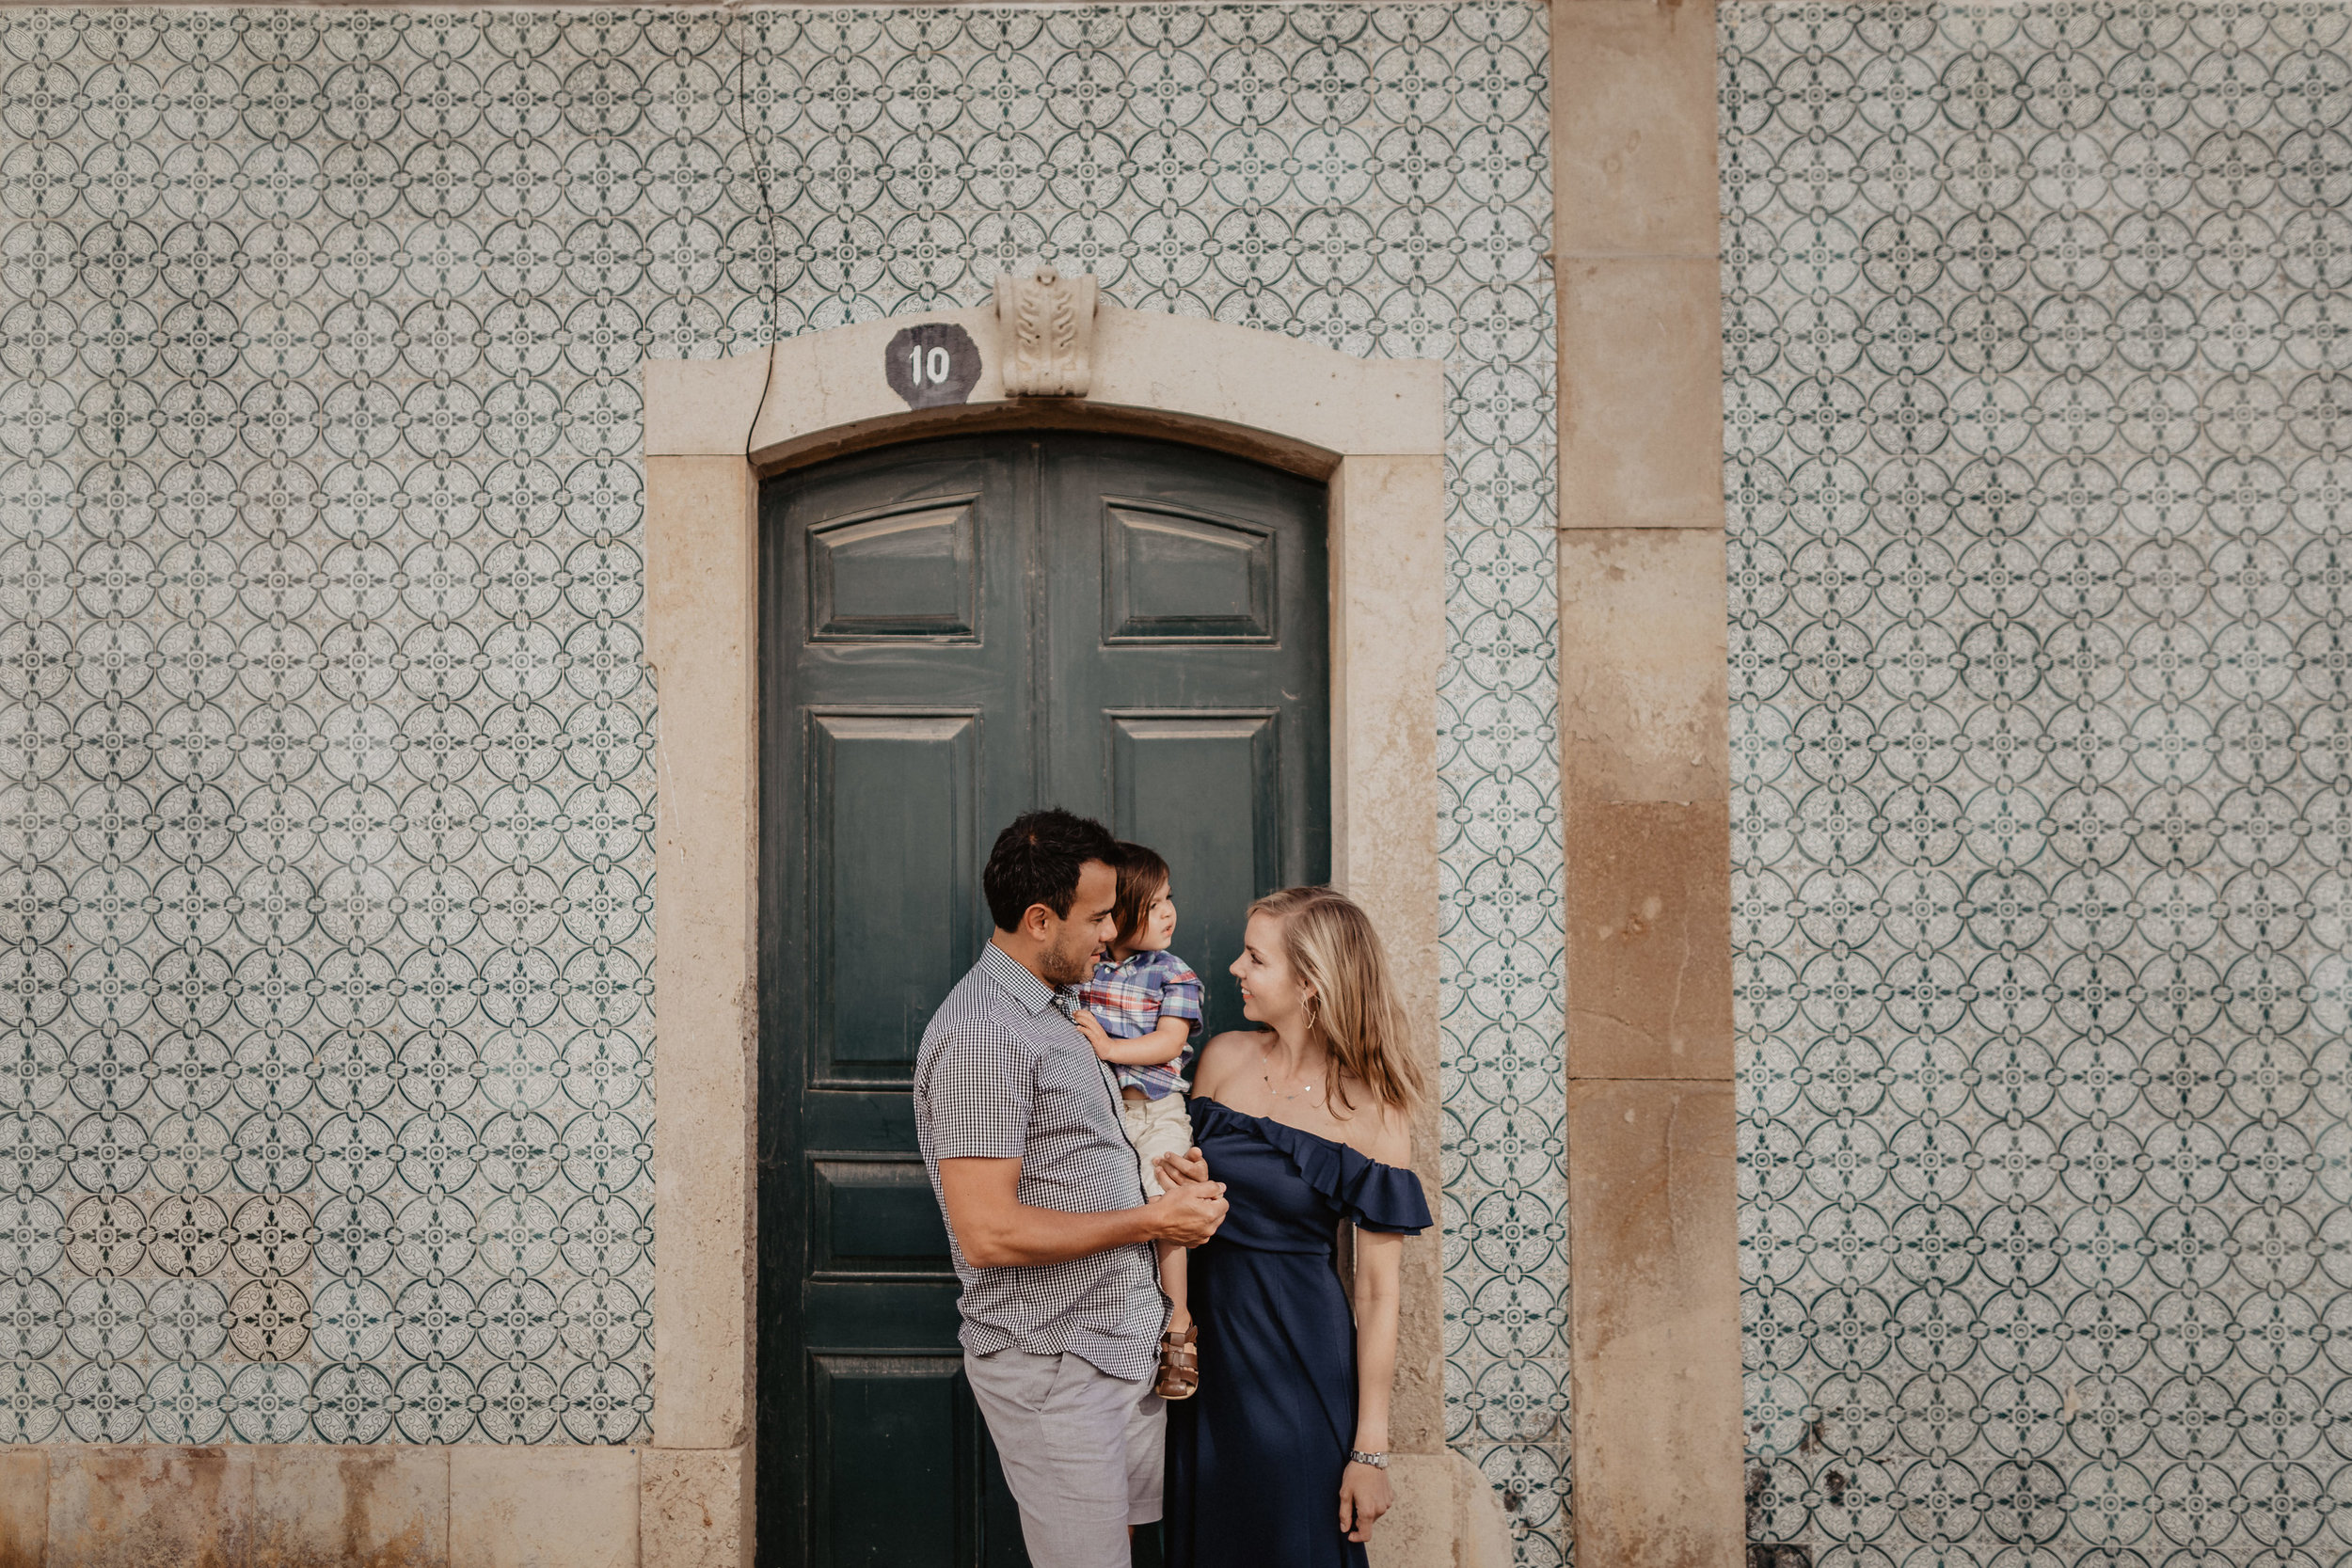 Lapela-Family-photography-Lagos-Algarve1.jpg